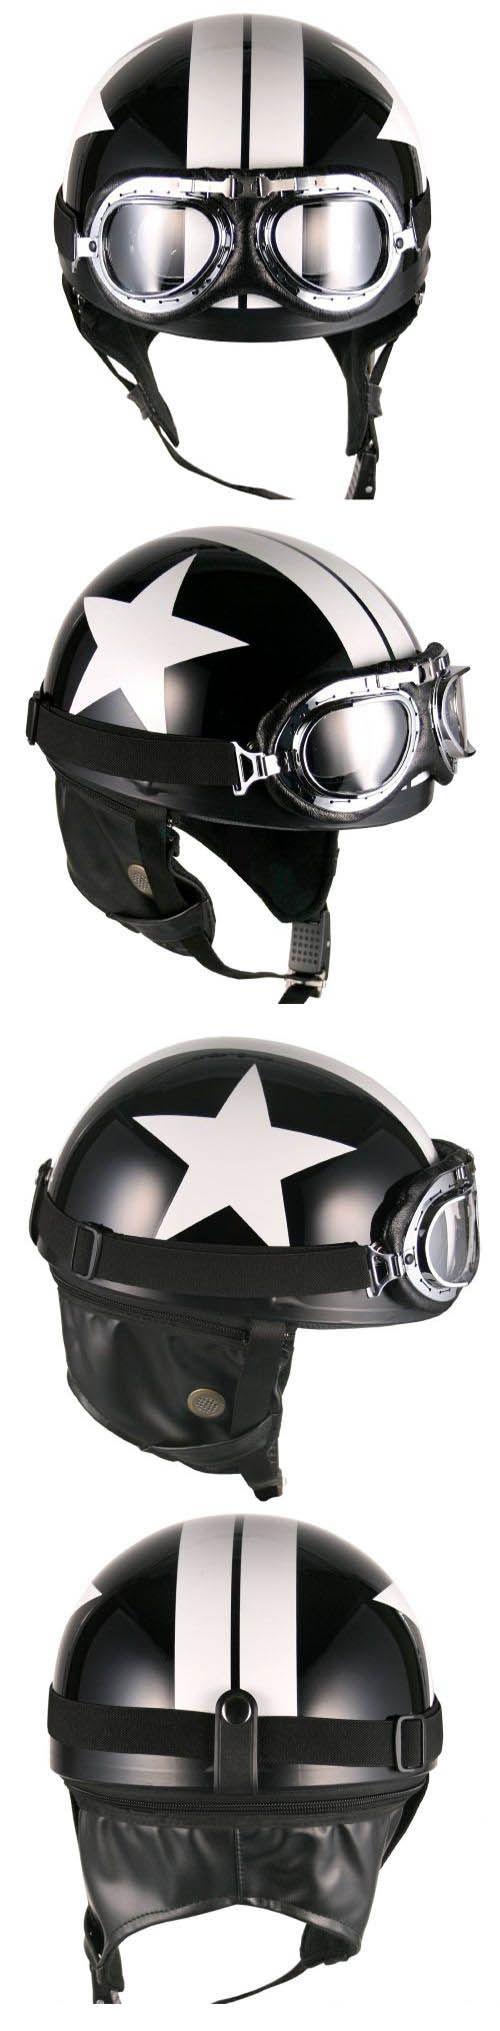 Black White Star Goggle Helmets Half Face Vintage Motorcycle Motorbike   eBay